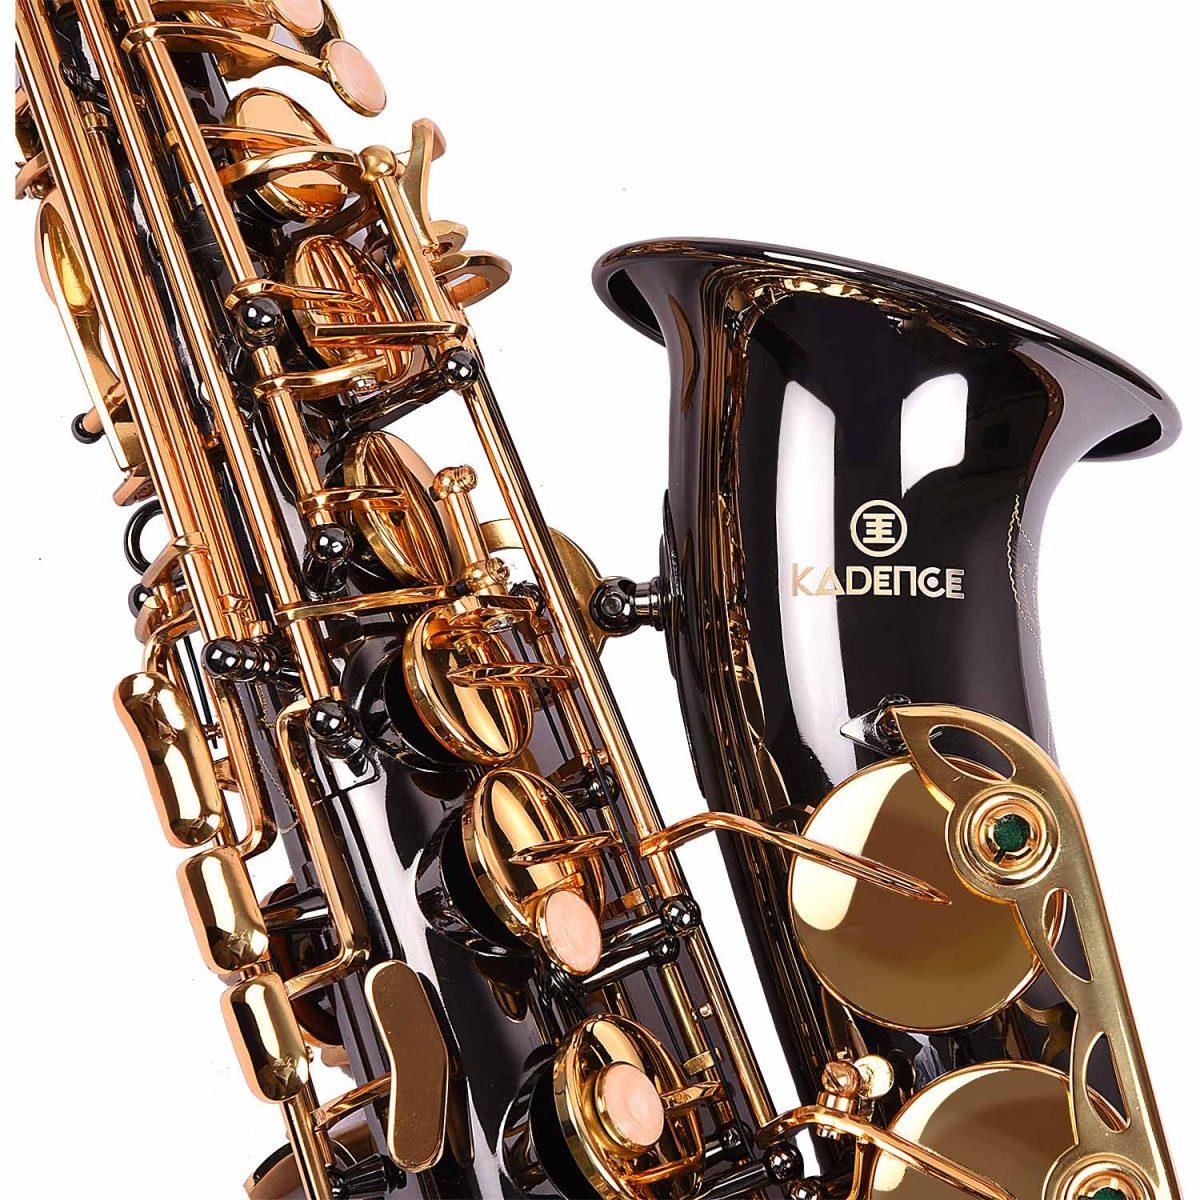 Kadence Saxophone KXB Blackgold